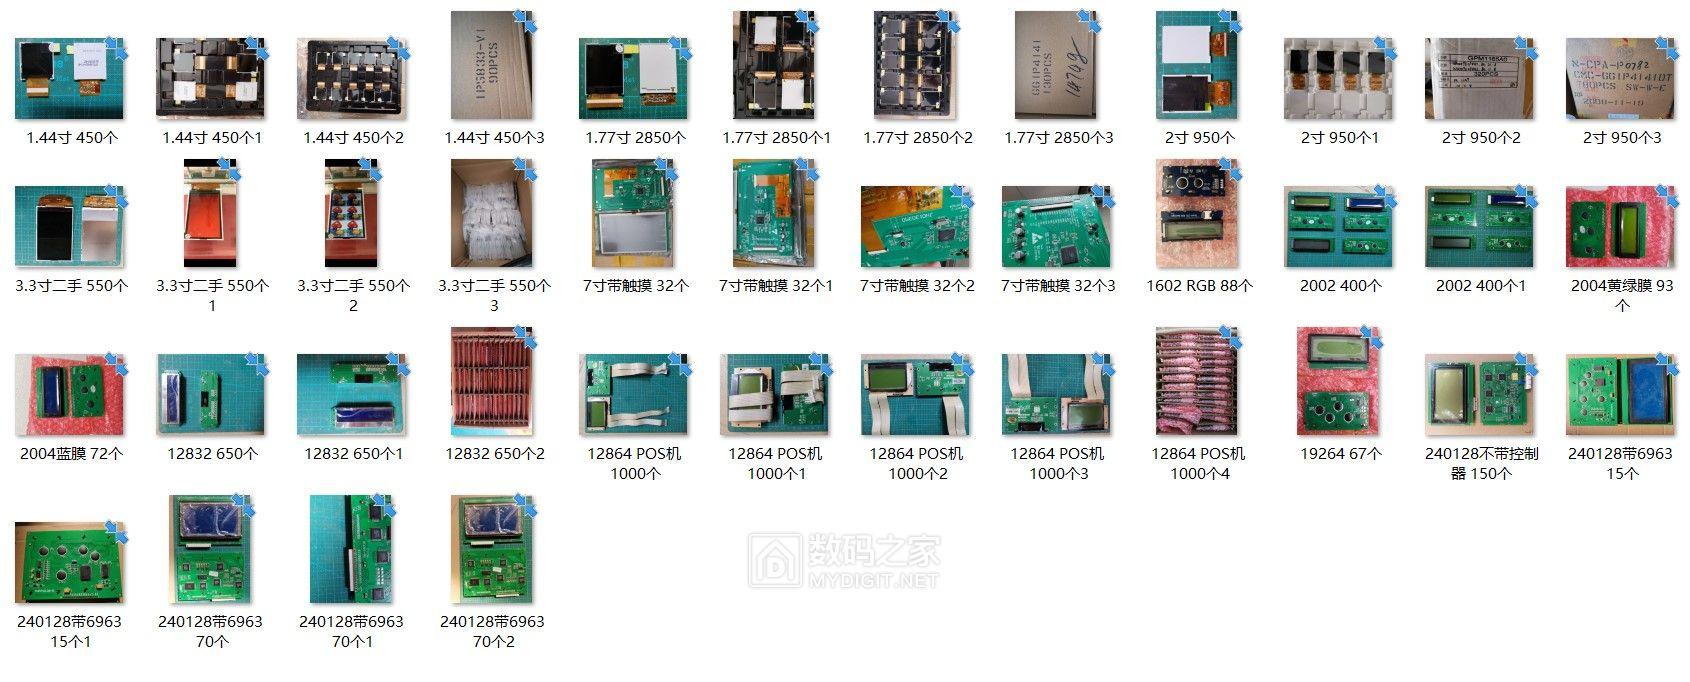 LCD 7寸 3.3寸 2寸 1.7